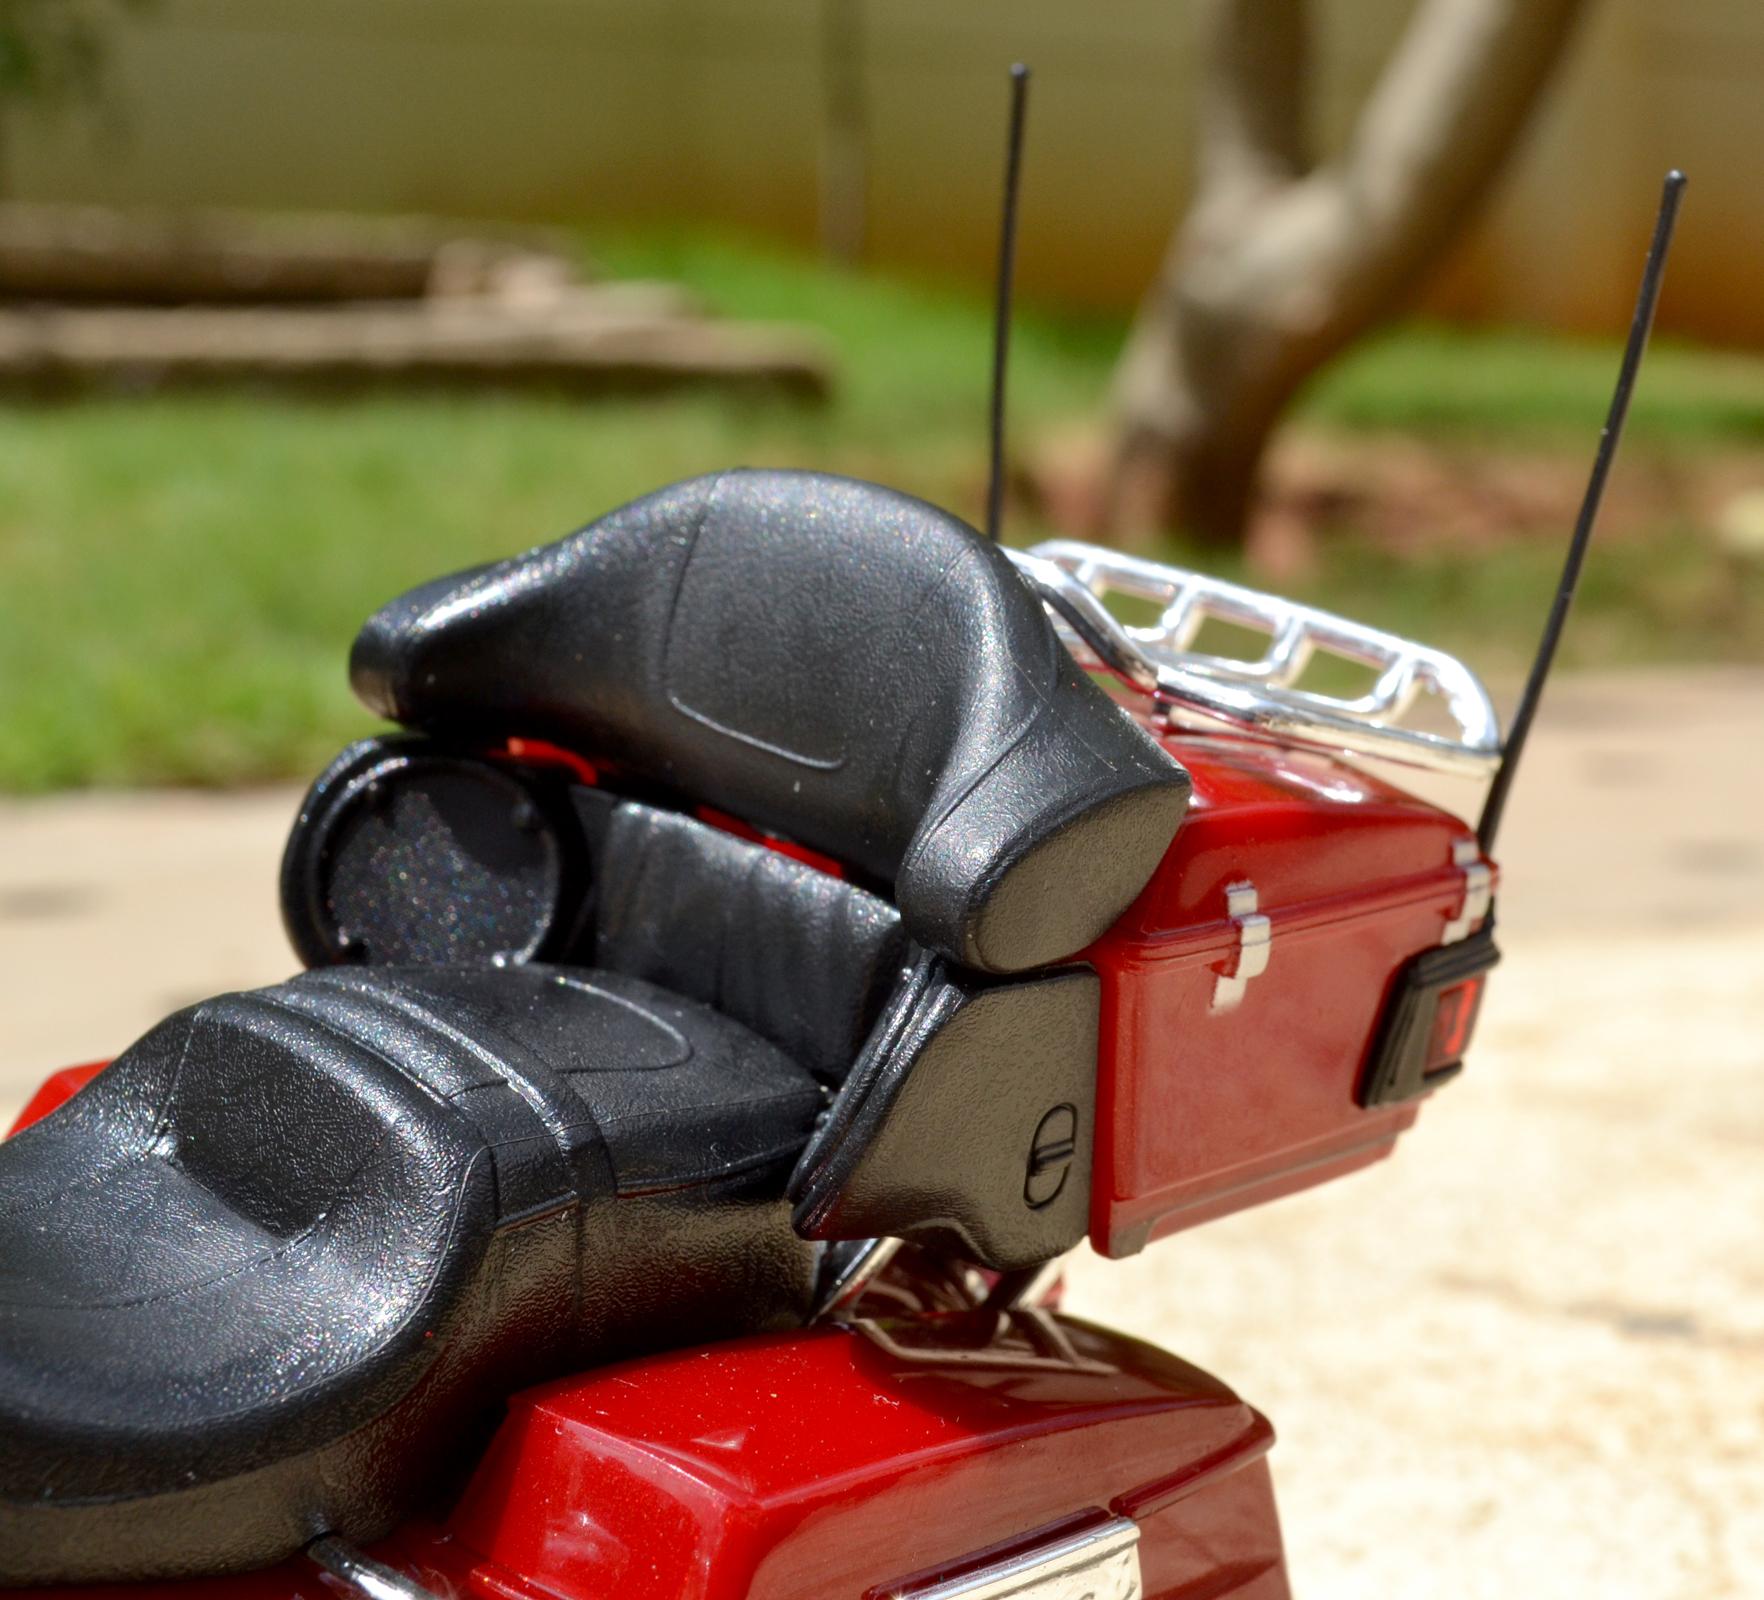 harley davidson electra glide flhtk ultra rear limited antena speaker box chrome maisto saddle radio xdiecast bags extra tour